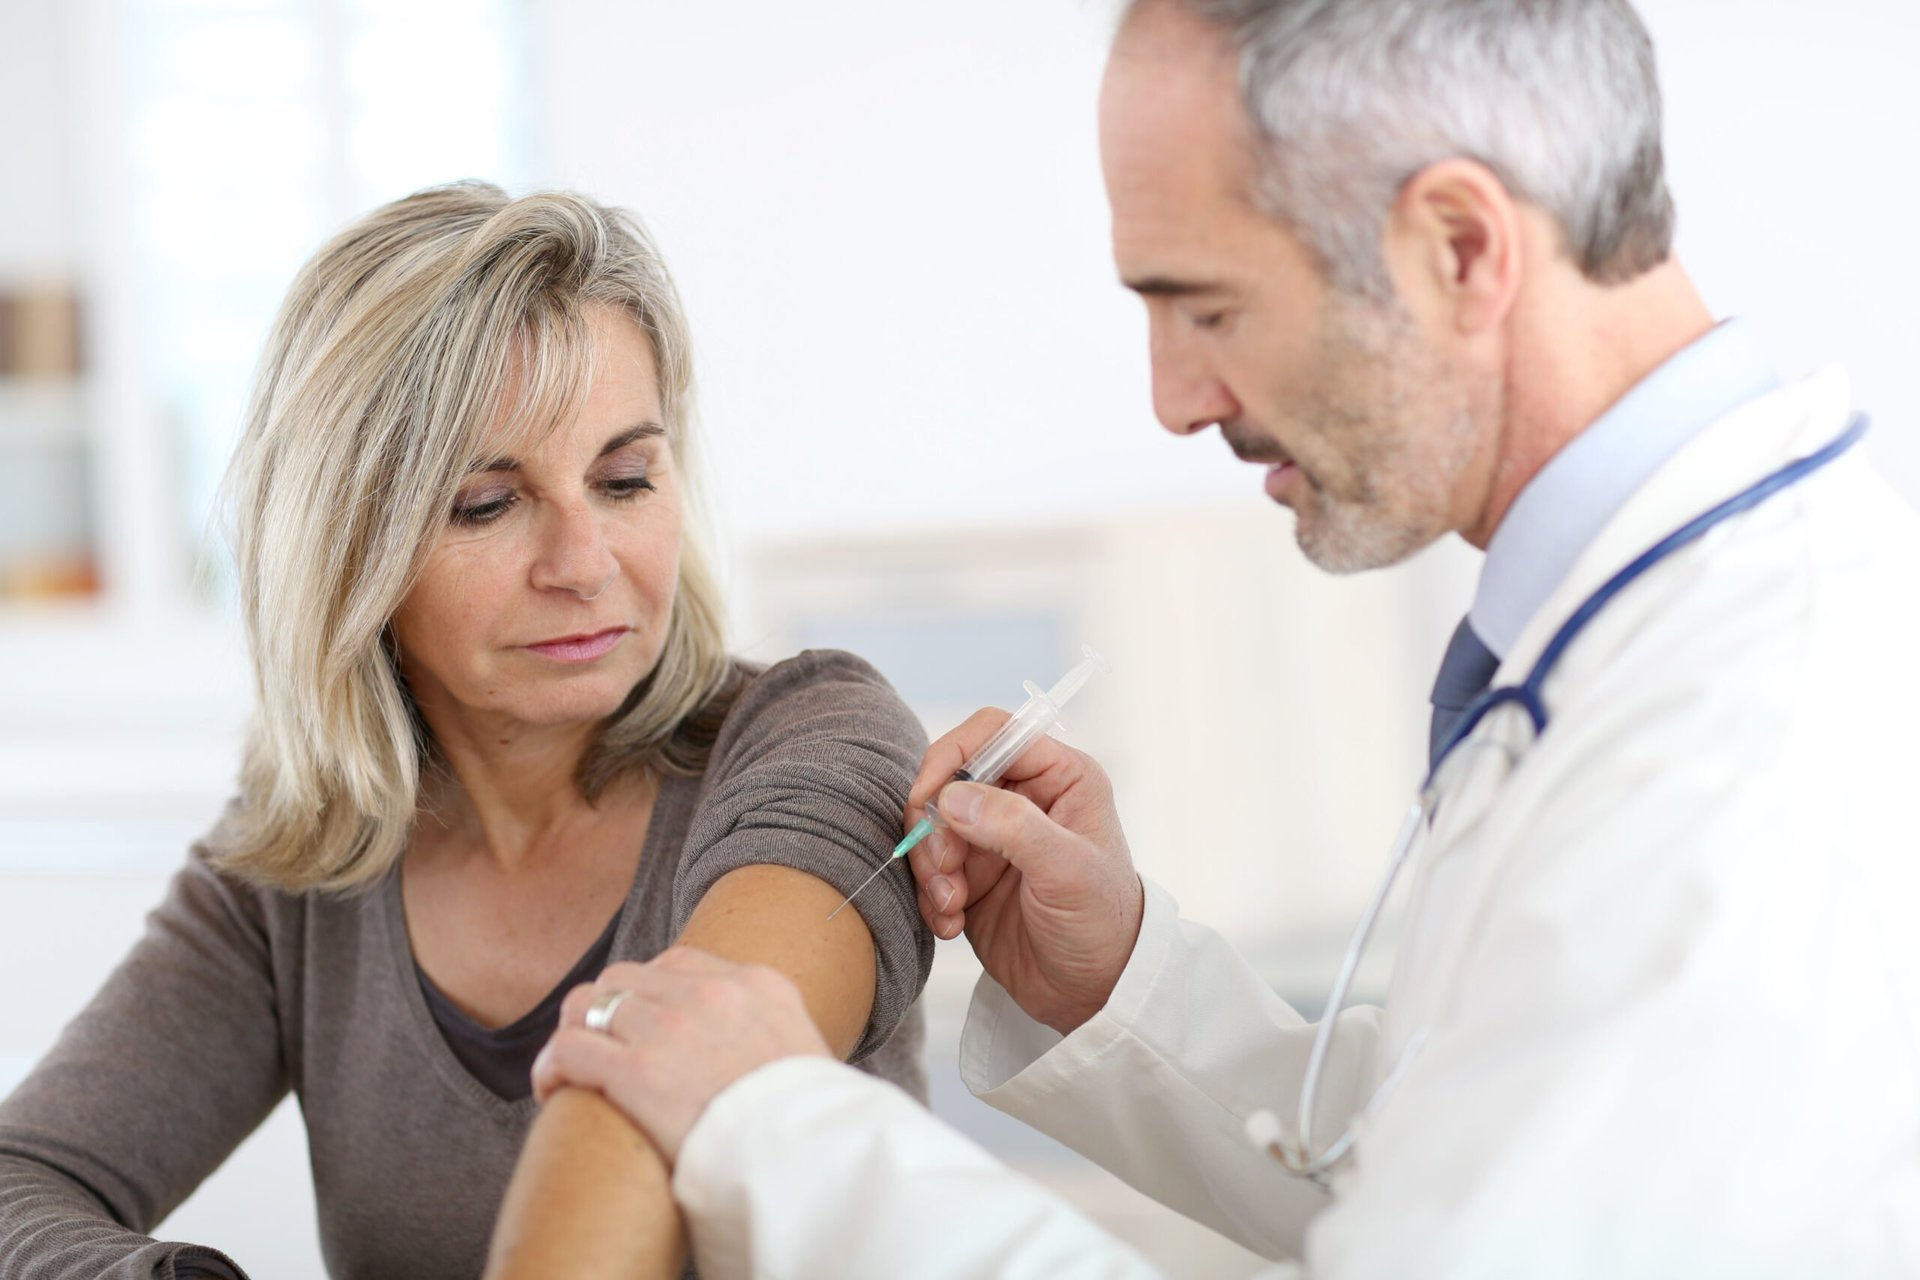 Woman getting flu vaccine